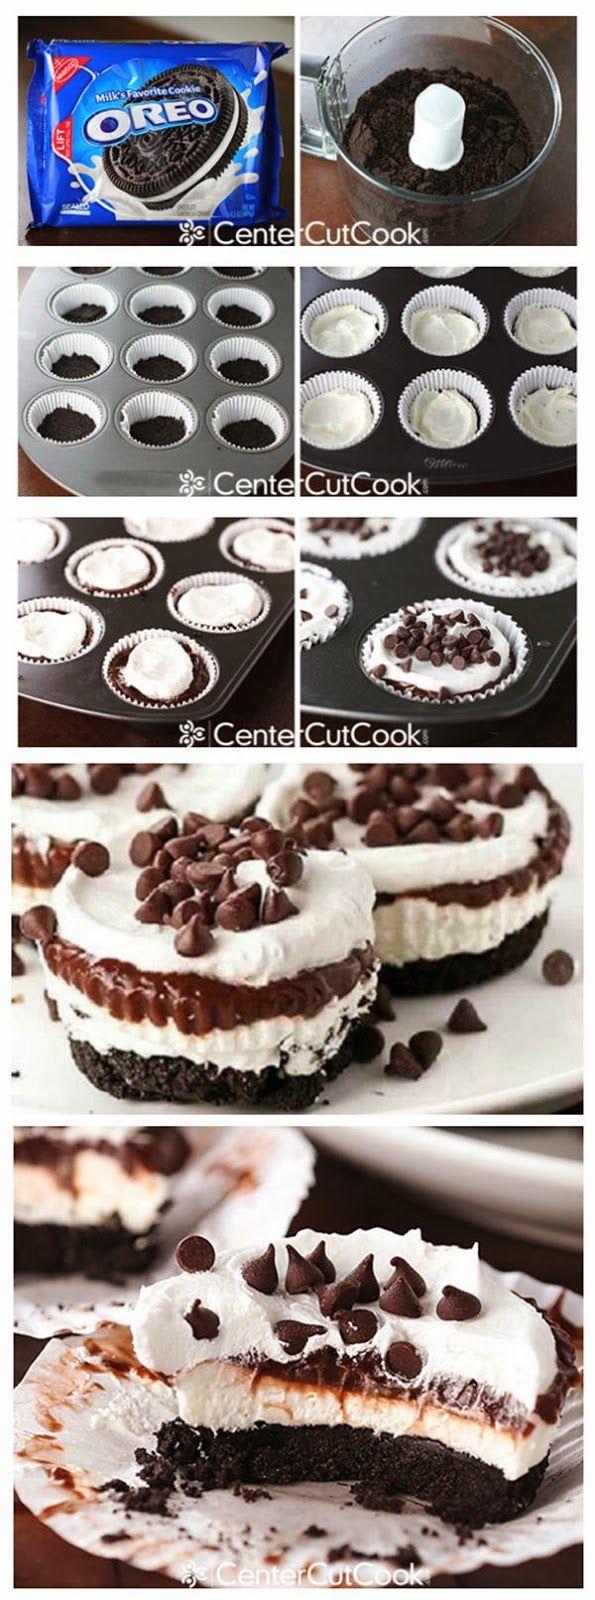 Best 25+ Lasagna cupcakes ideas only on Pinterest | Lasagna bites ...